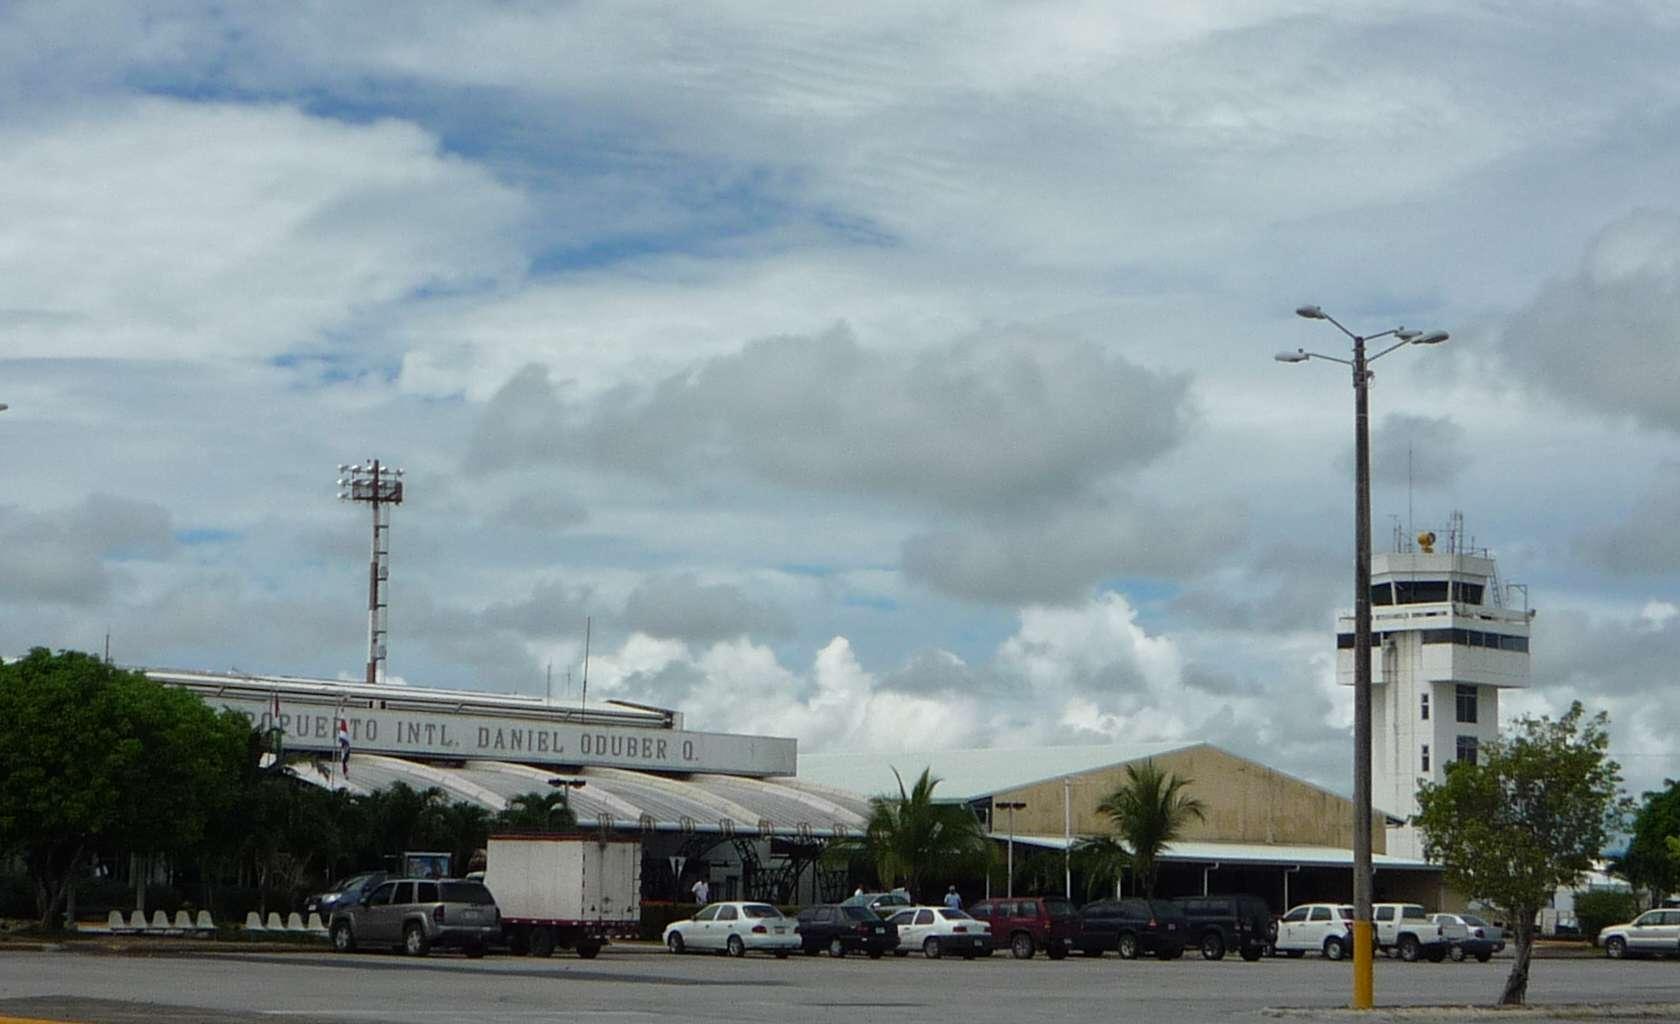 Daniel Oduber International Airport, Liberia